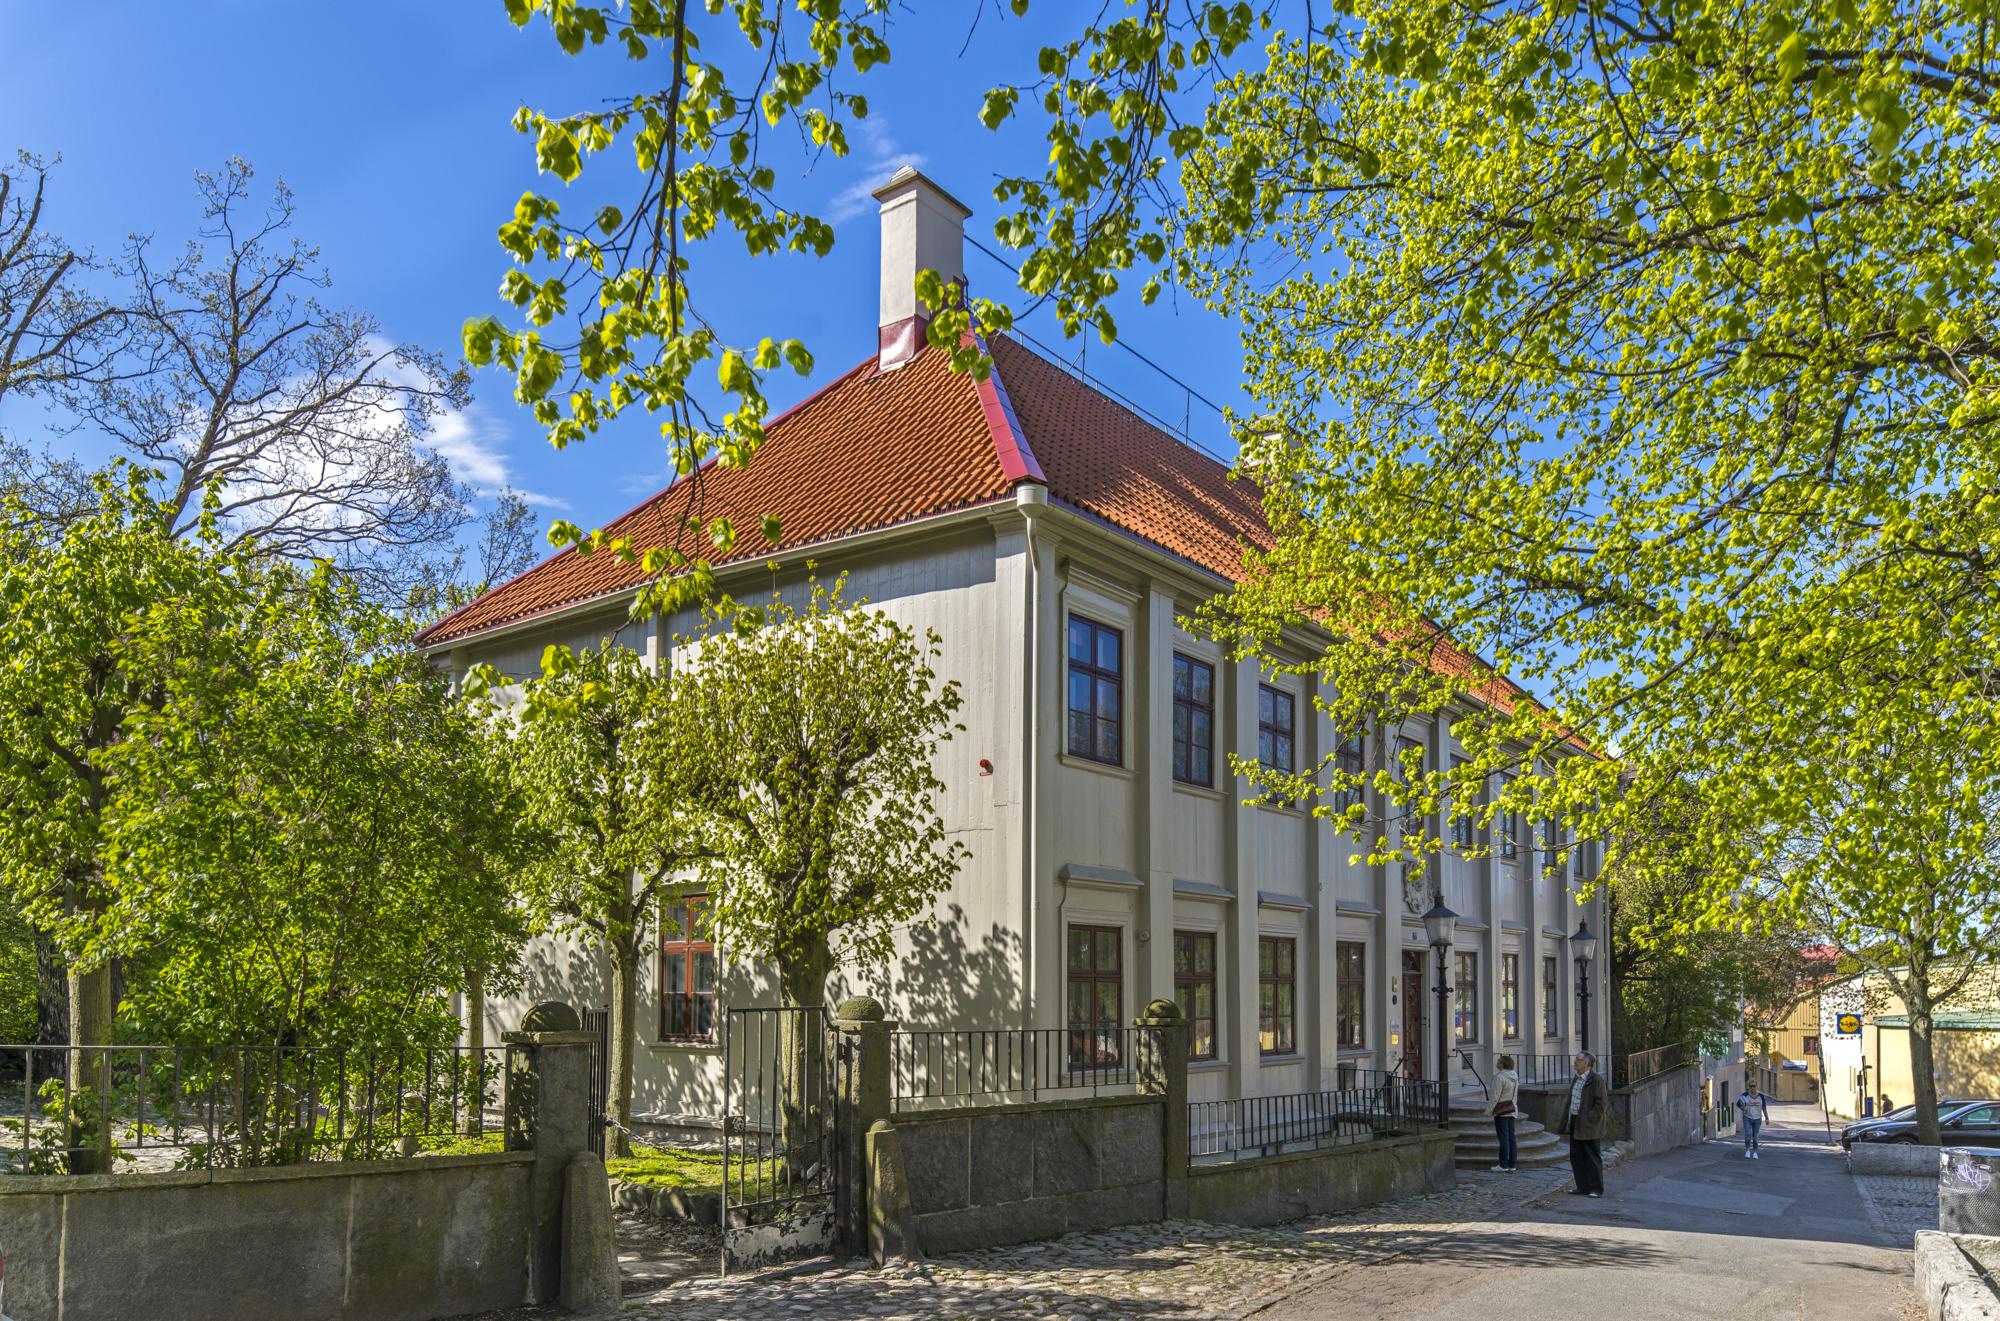 Utsidan av Gathenhielmska Huset vid Stigbergstorget